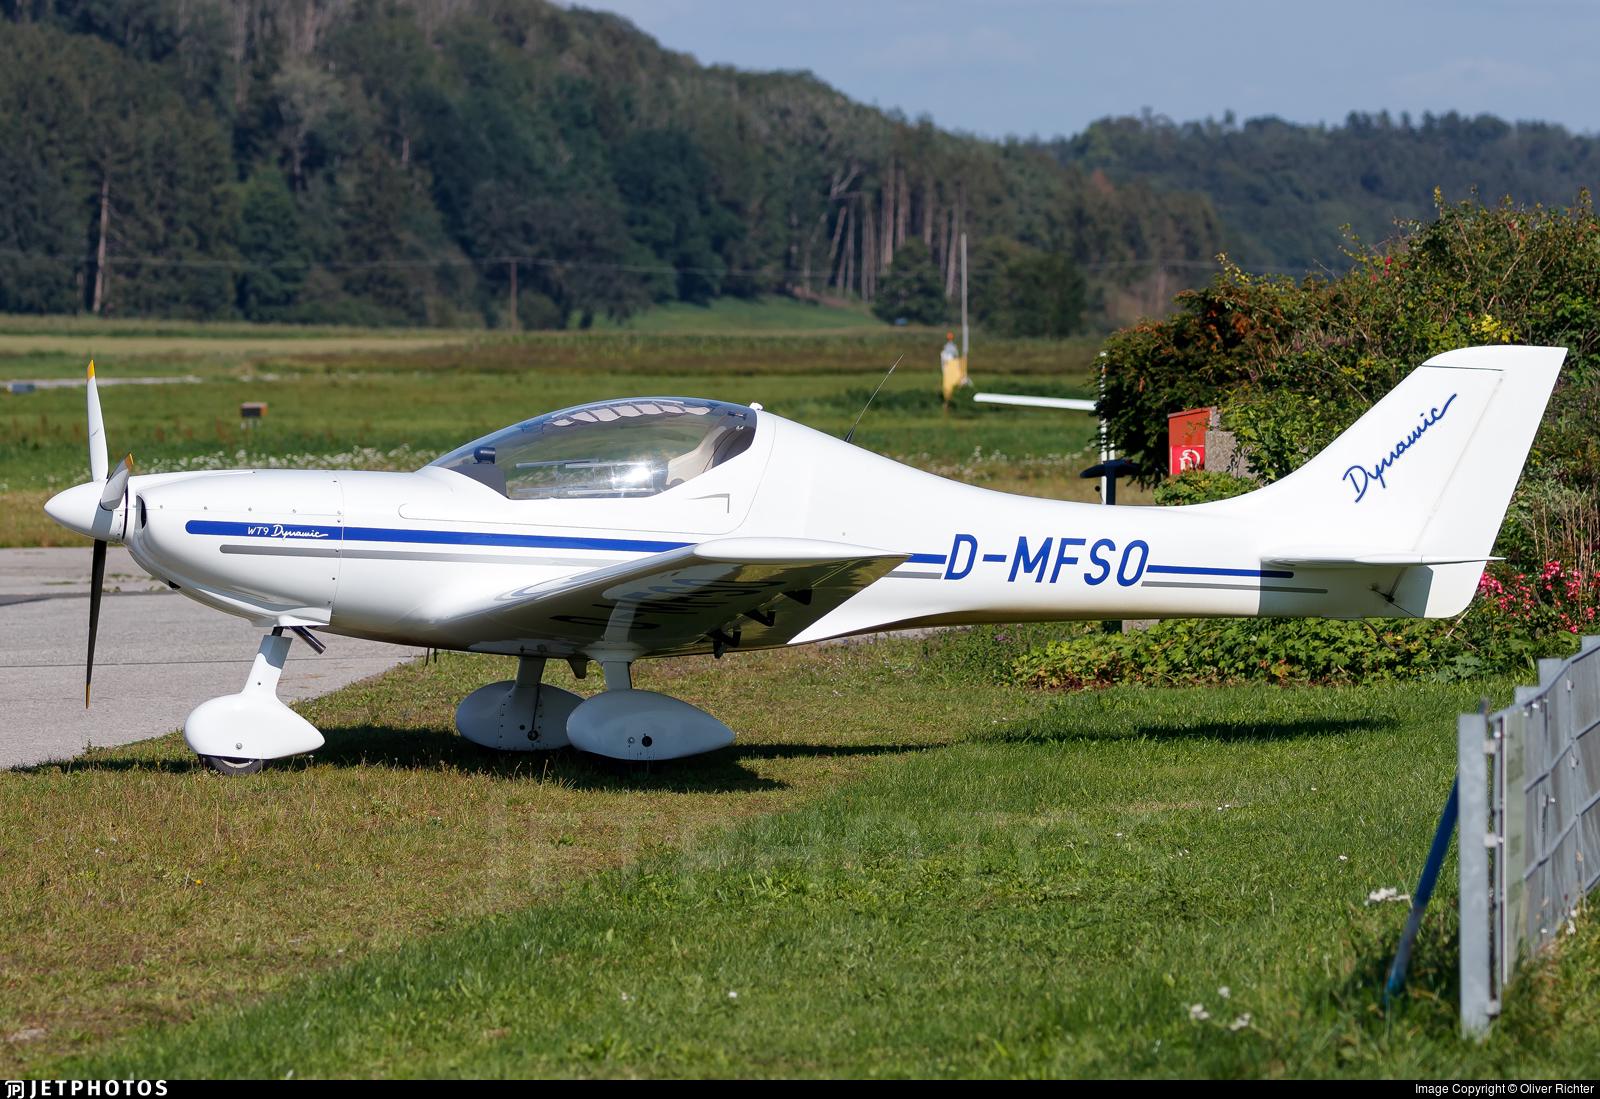 D-MFSO - AeroSpool WT9 Dynamic - Private